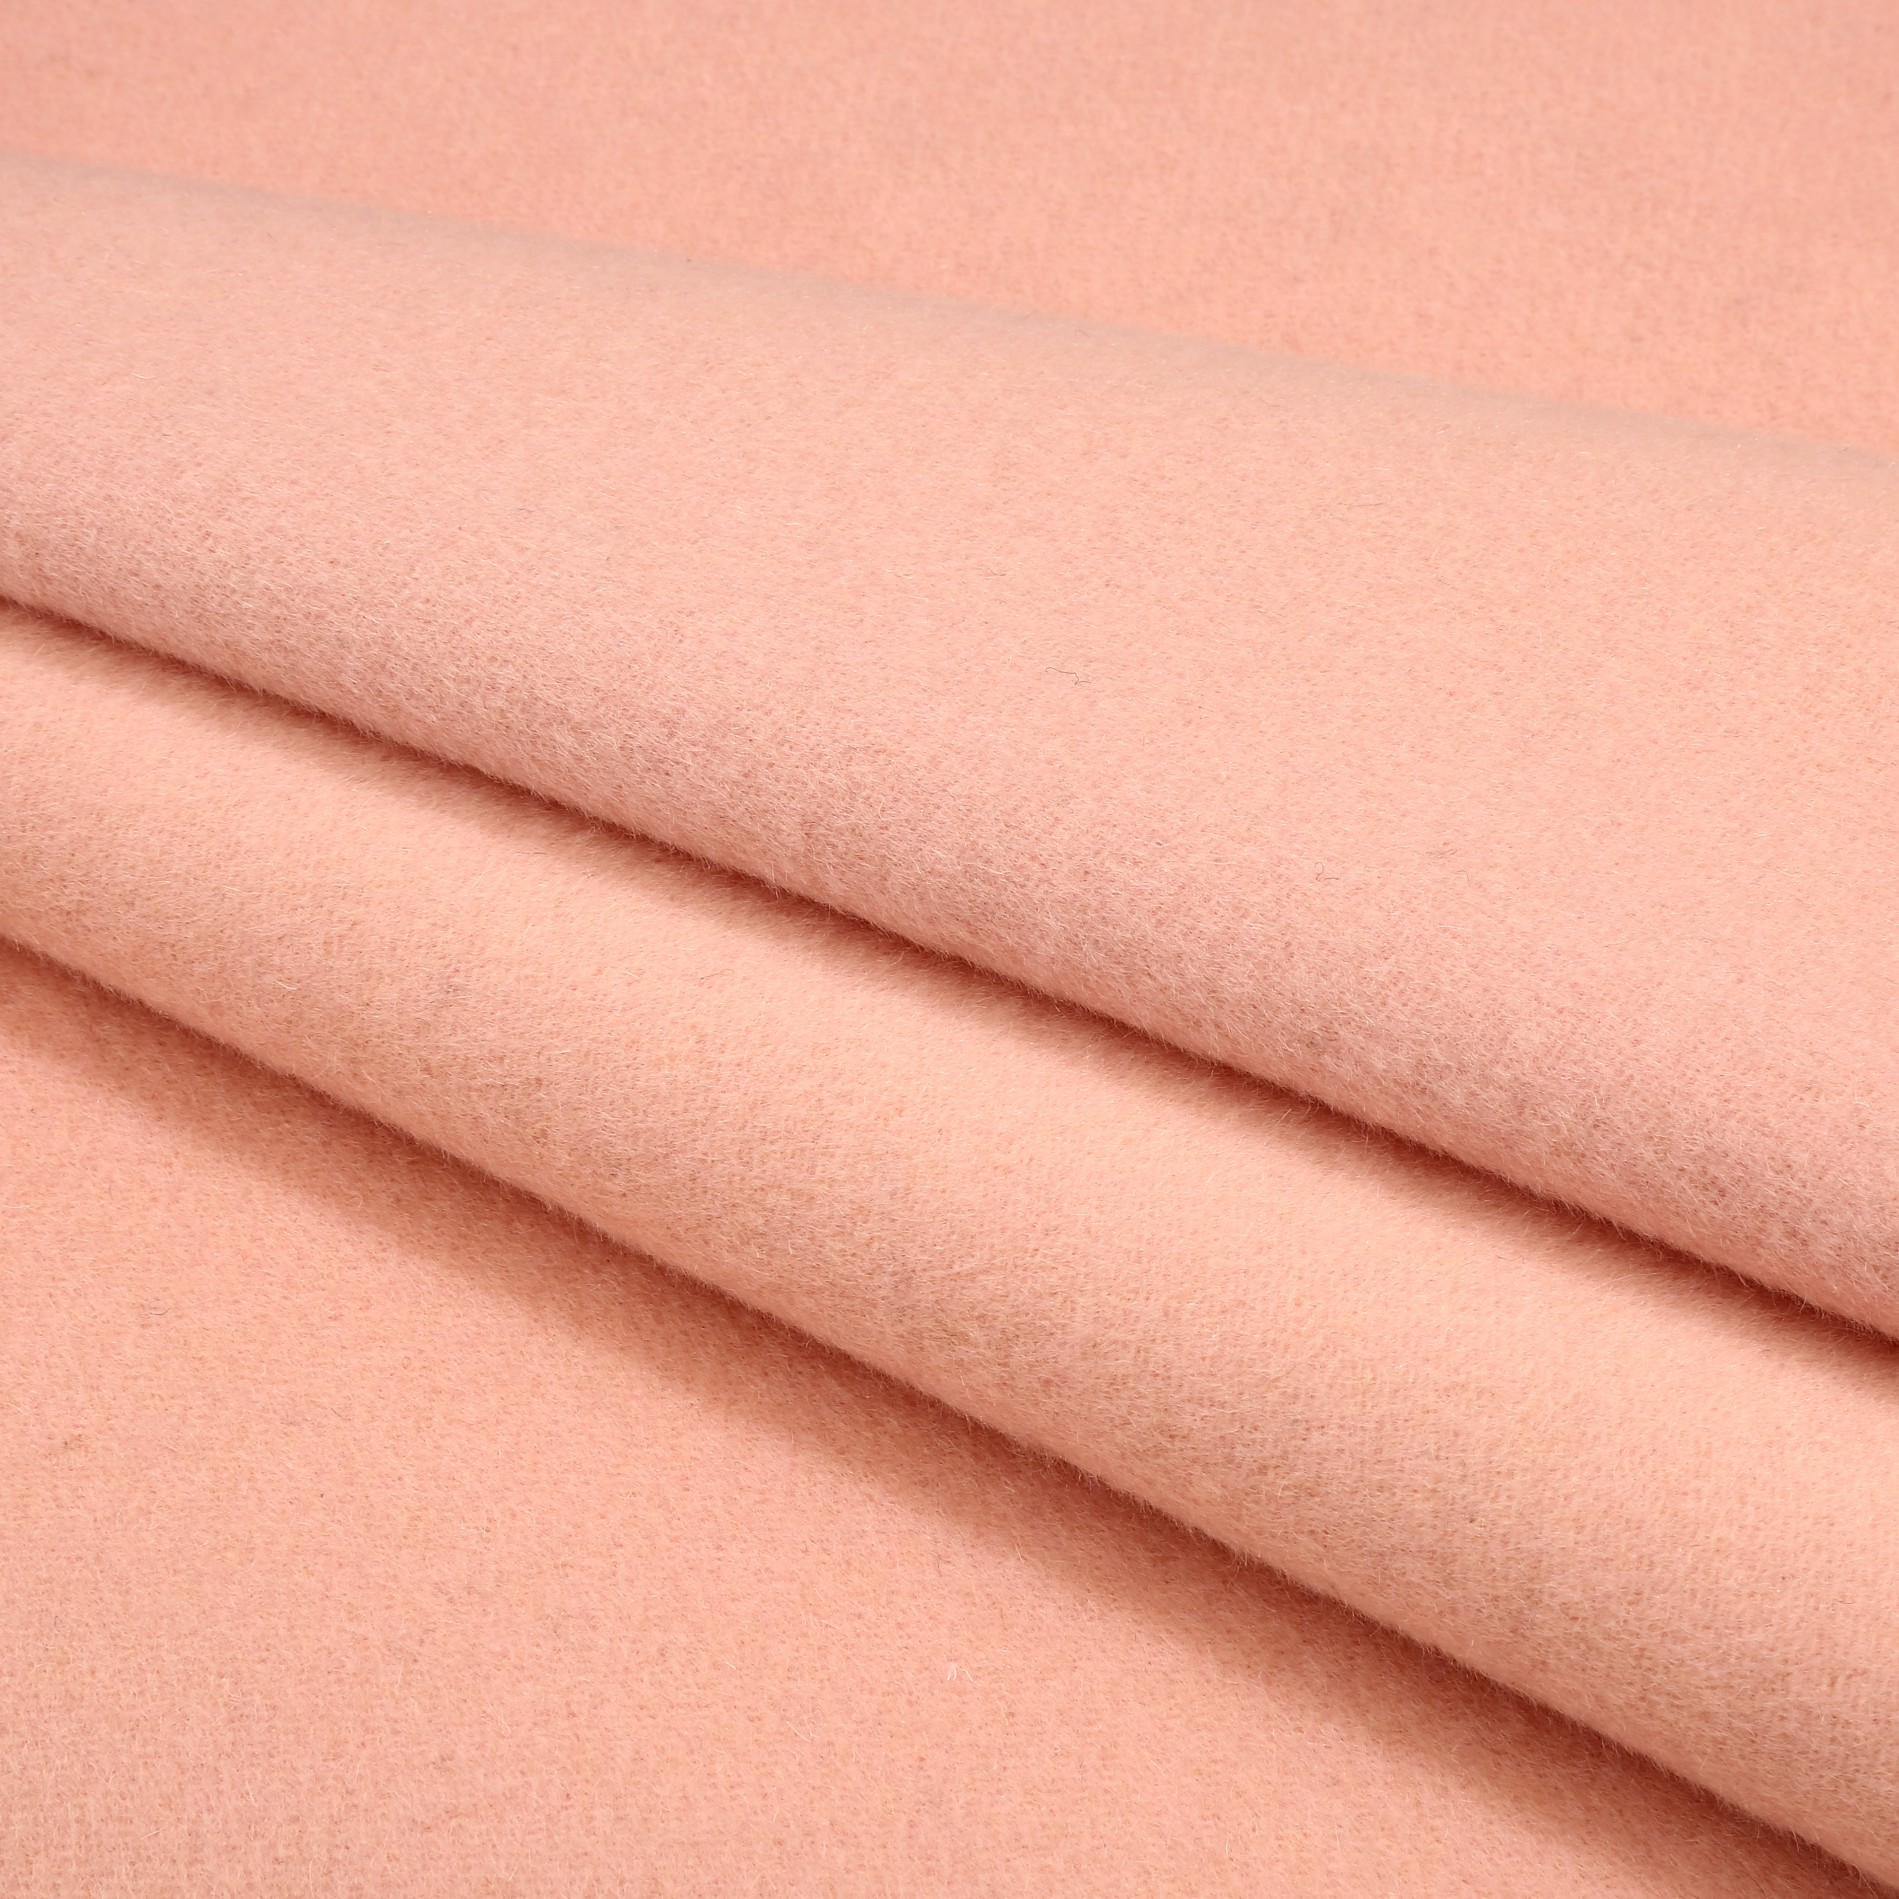 Woolen Double Overcoating Fabric Manufacturers, Woolen Double Overcoating Fabric Factory, Supply Woolen Double Overcoating Fabric